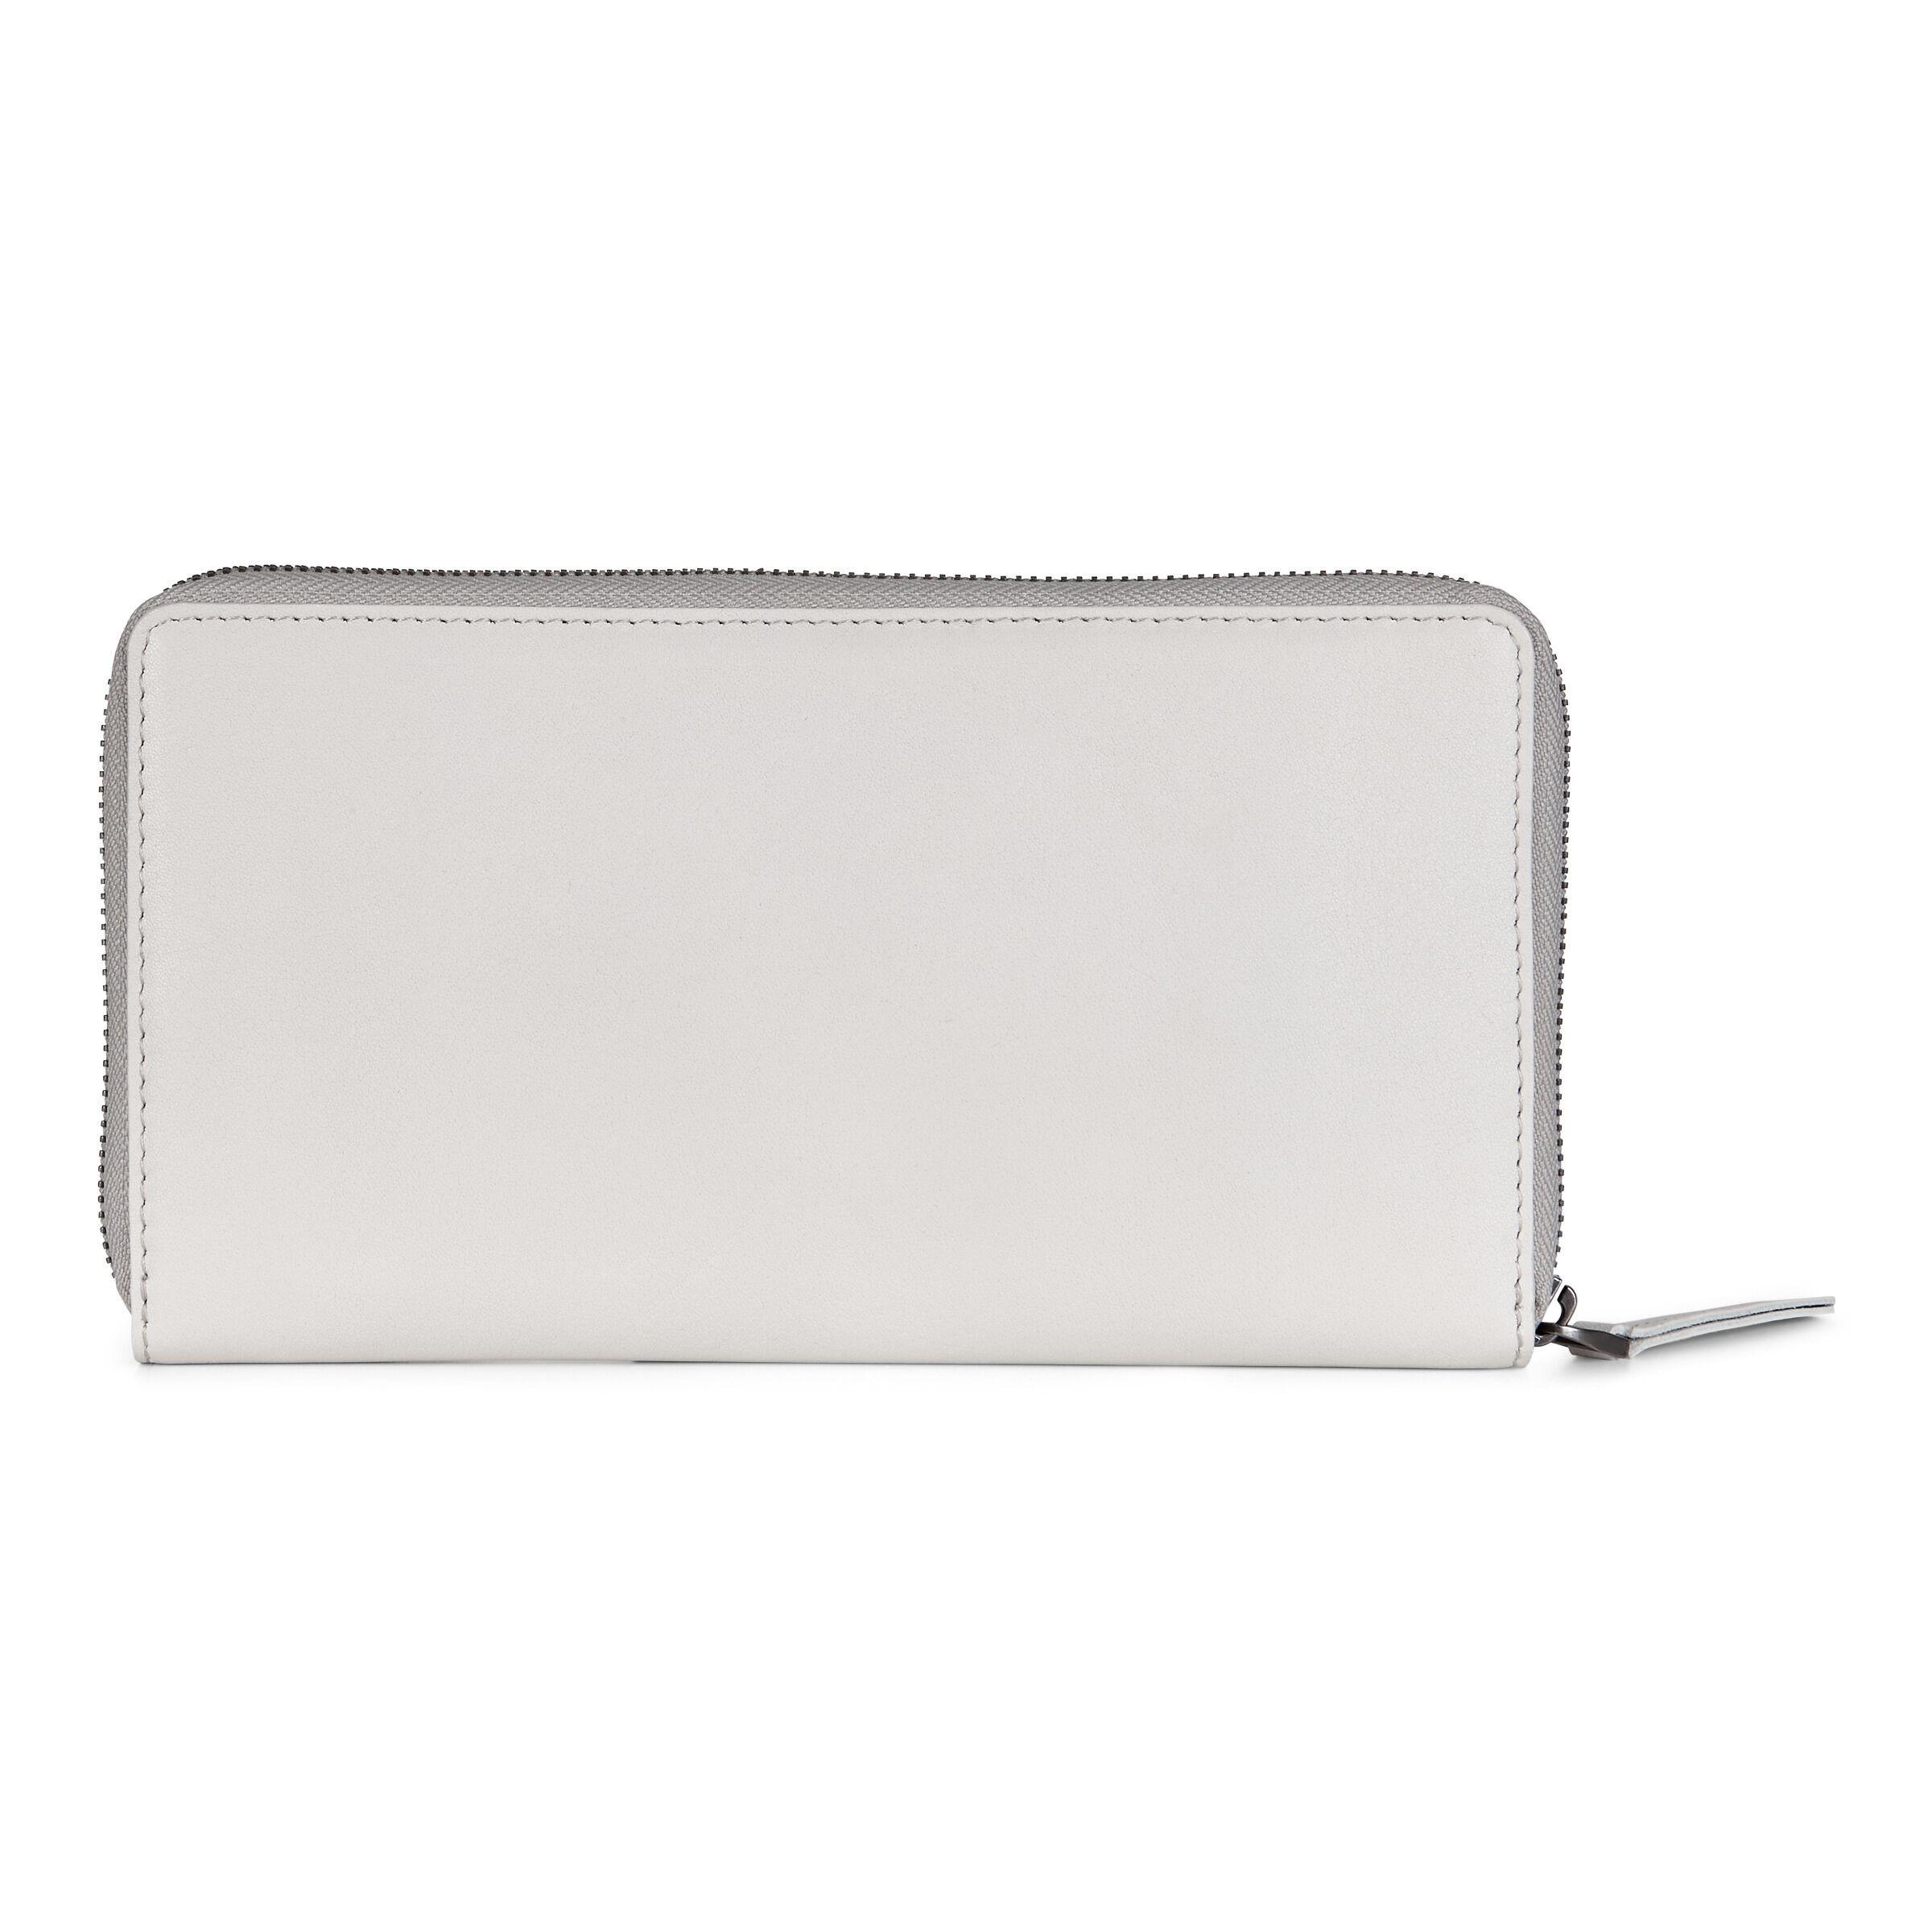 ECCO Casper Travel Wallet: One Size - Offwhite